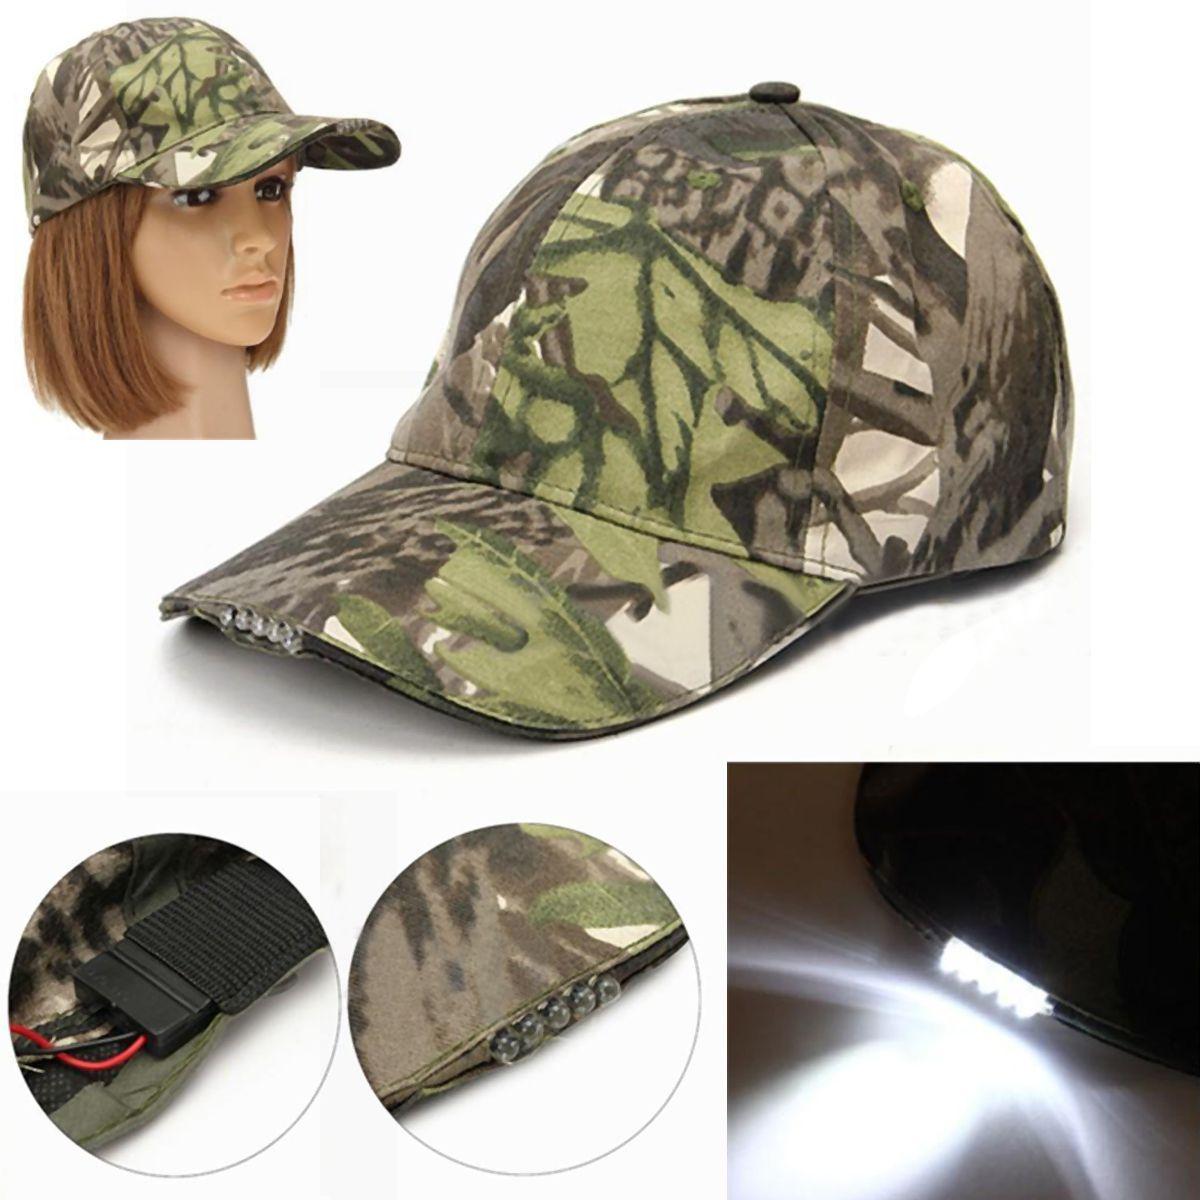 ac6629fac Hiking Camping Fishing 5 LED Light Adjustable Strap Baseball Cap Hat  Camouflage for Fishing Walking Hat